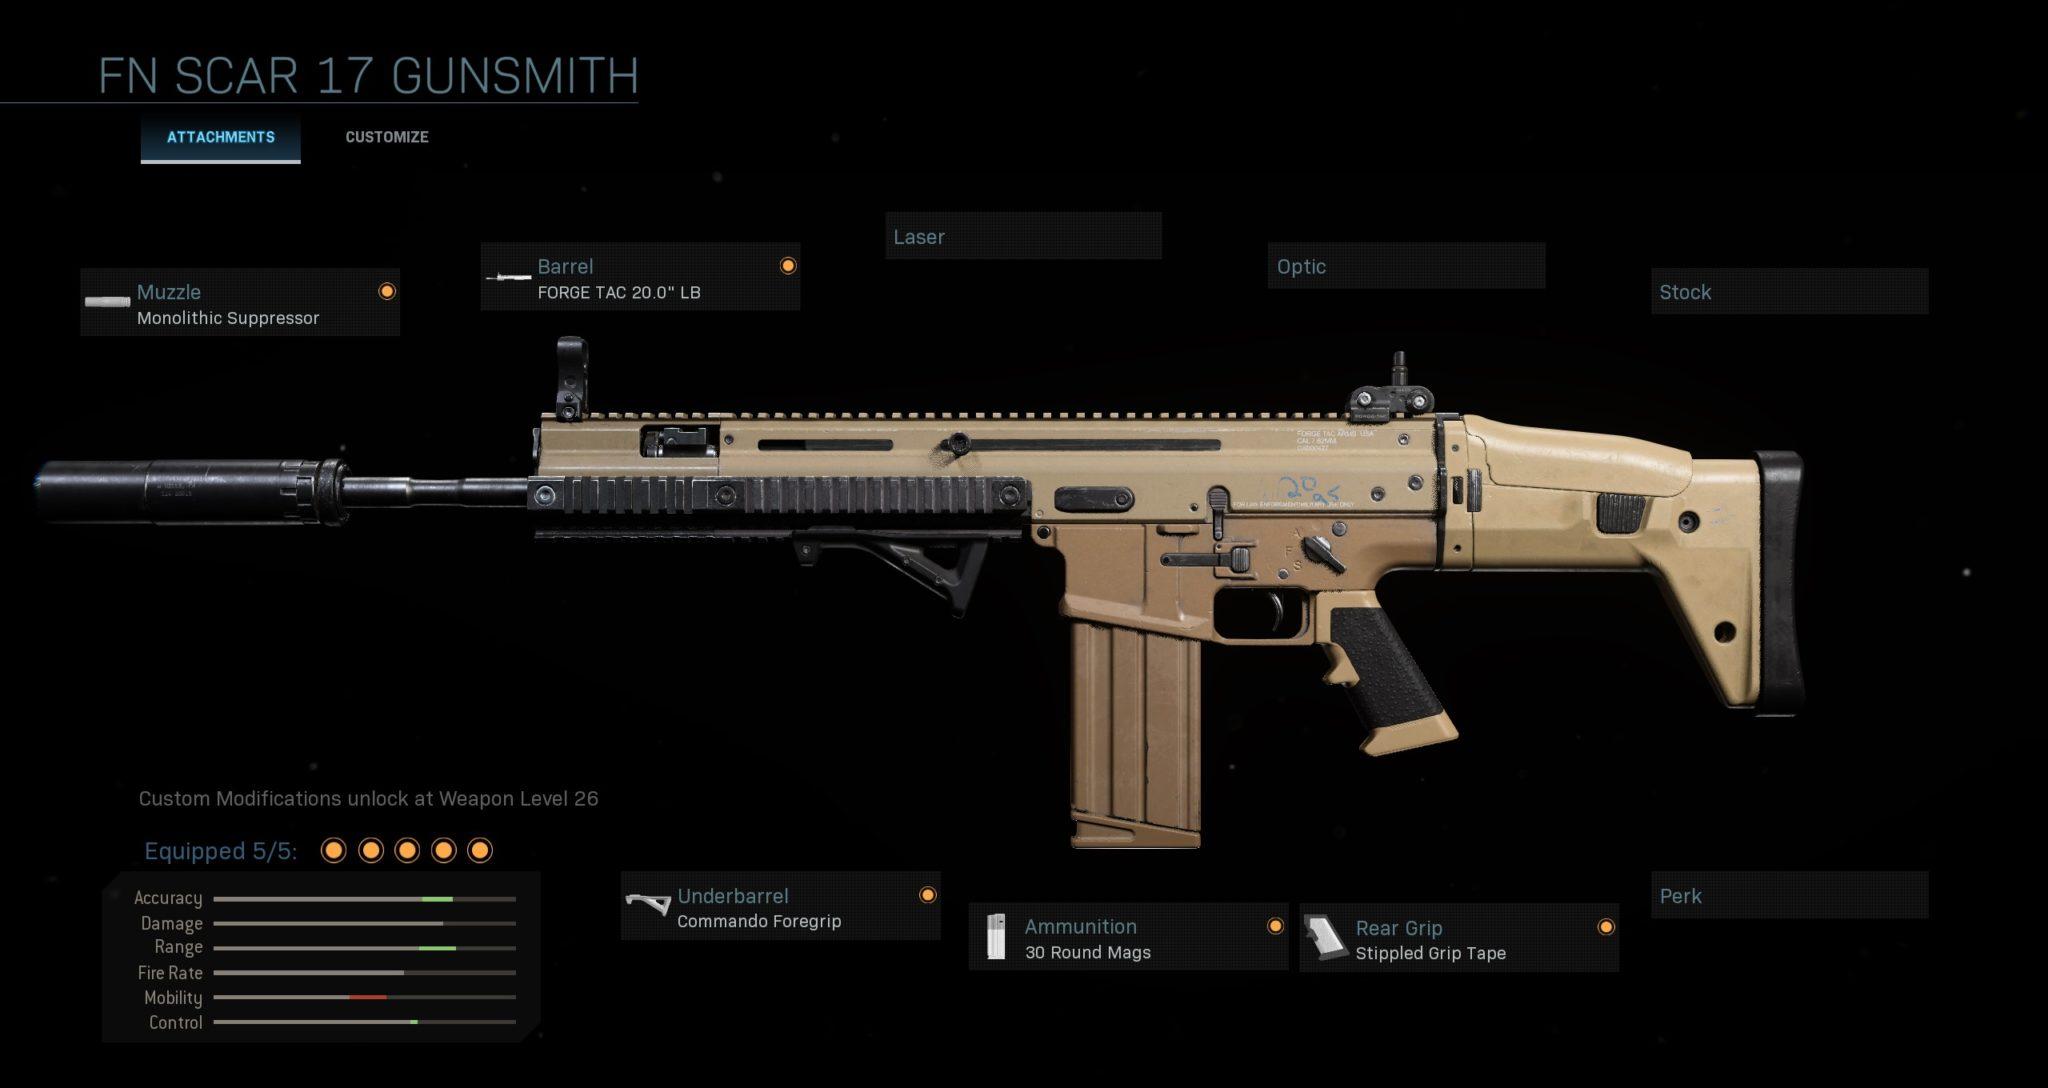 FN 17 Scar Warzone loadout